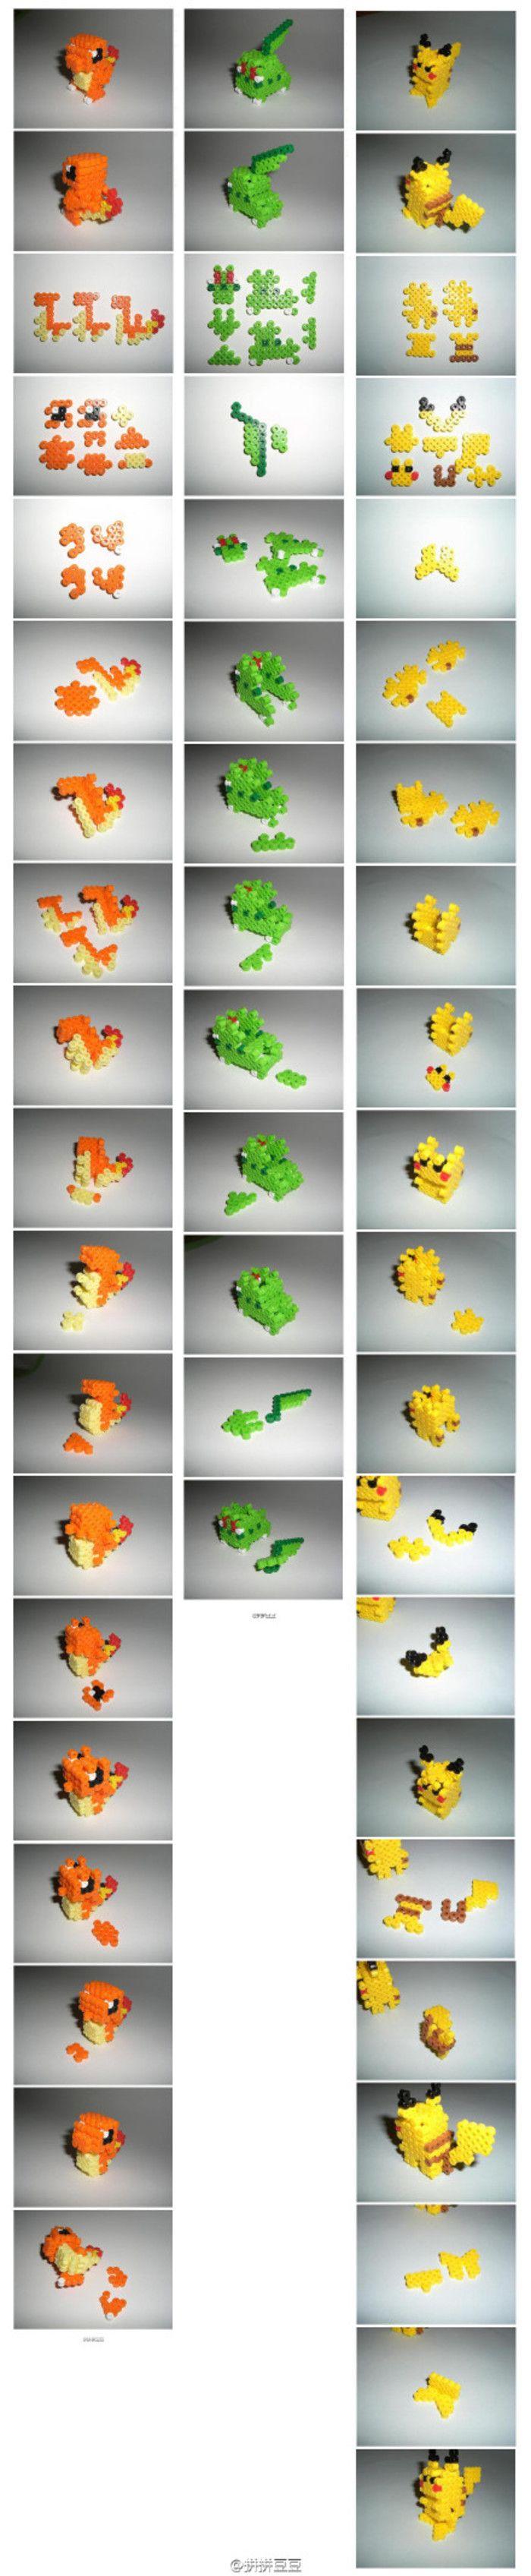 3D Pokemon Perler Bead Characters (Charmander, Chikorita, Pikachu) #Perler